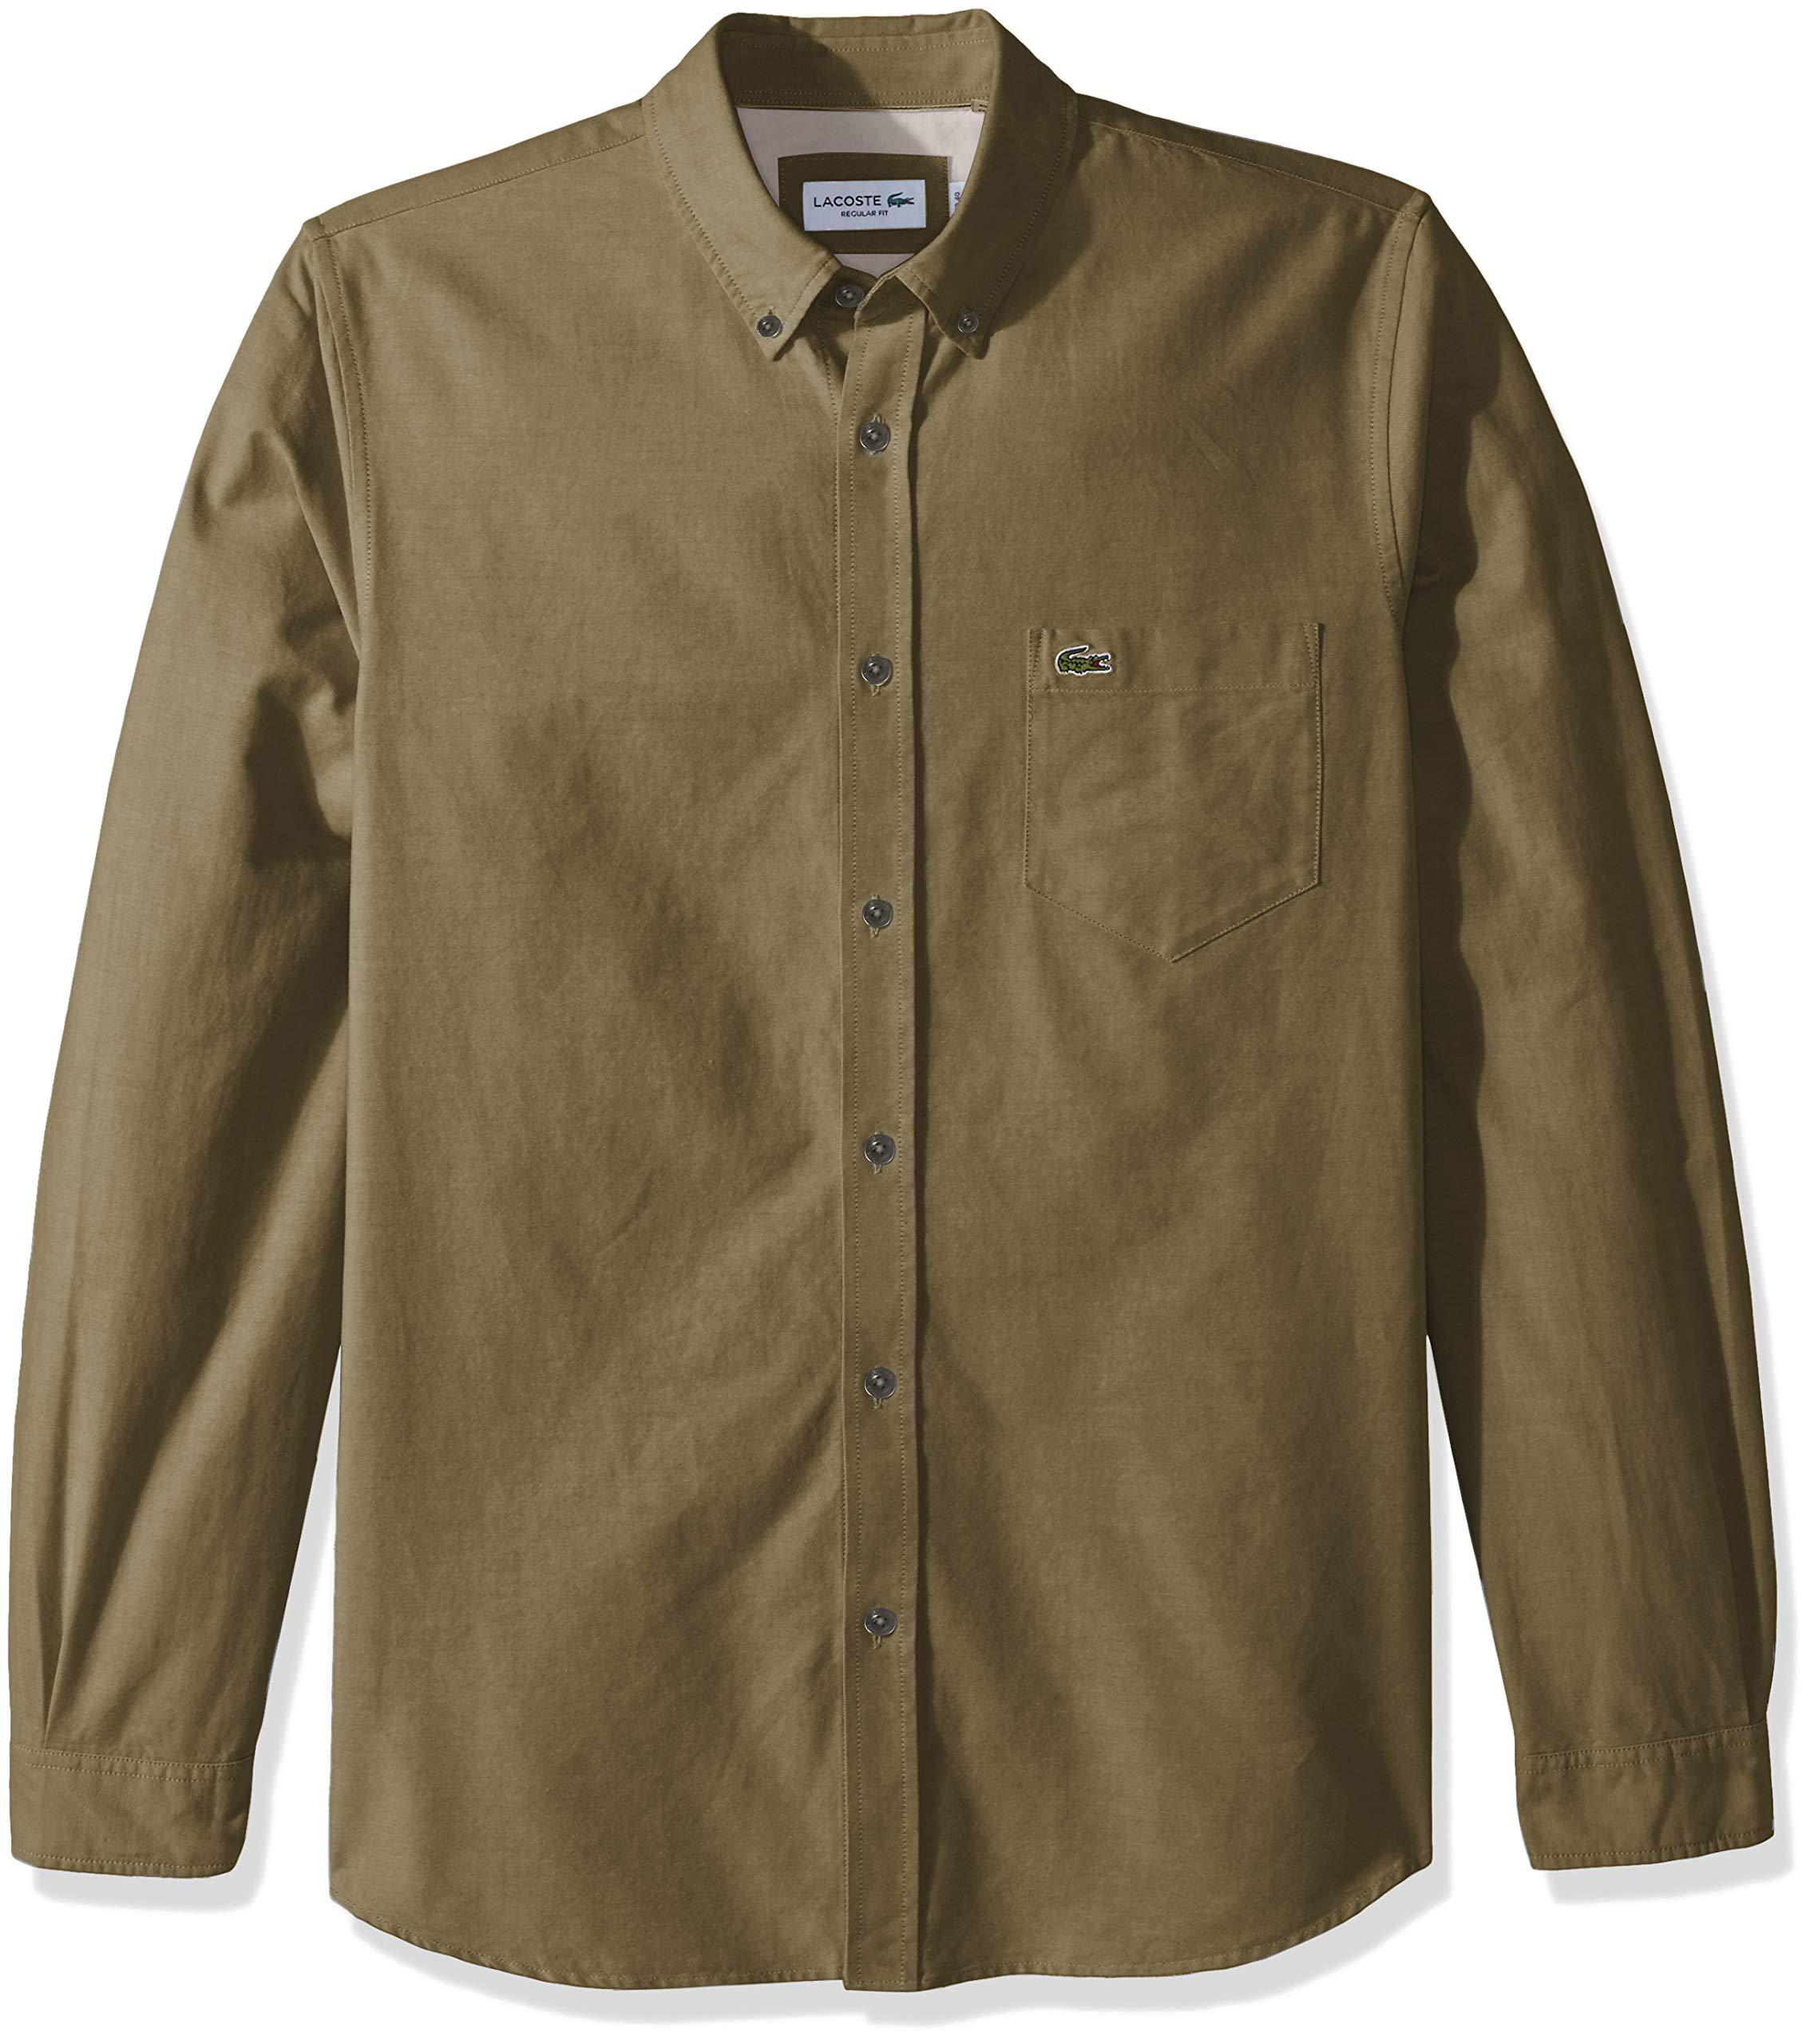 35834e6f2 Galleon - Lacoste Men s Long Sleeve Oxford Button Down Collar Regular Fit  Woven Shirt